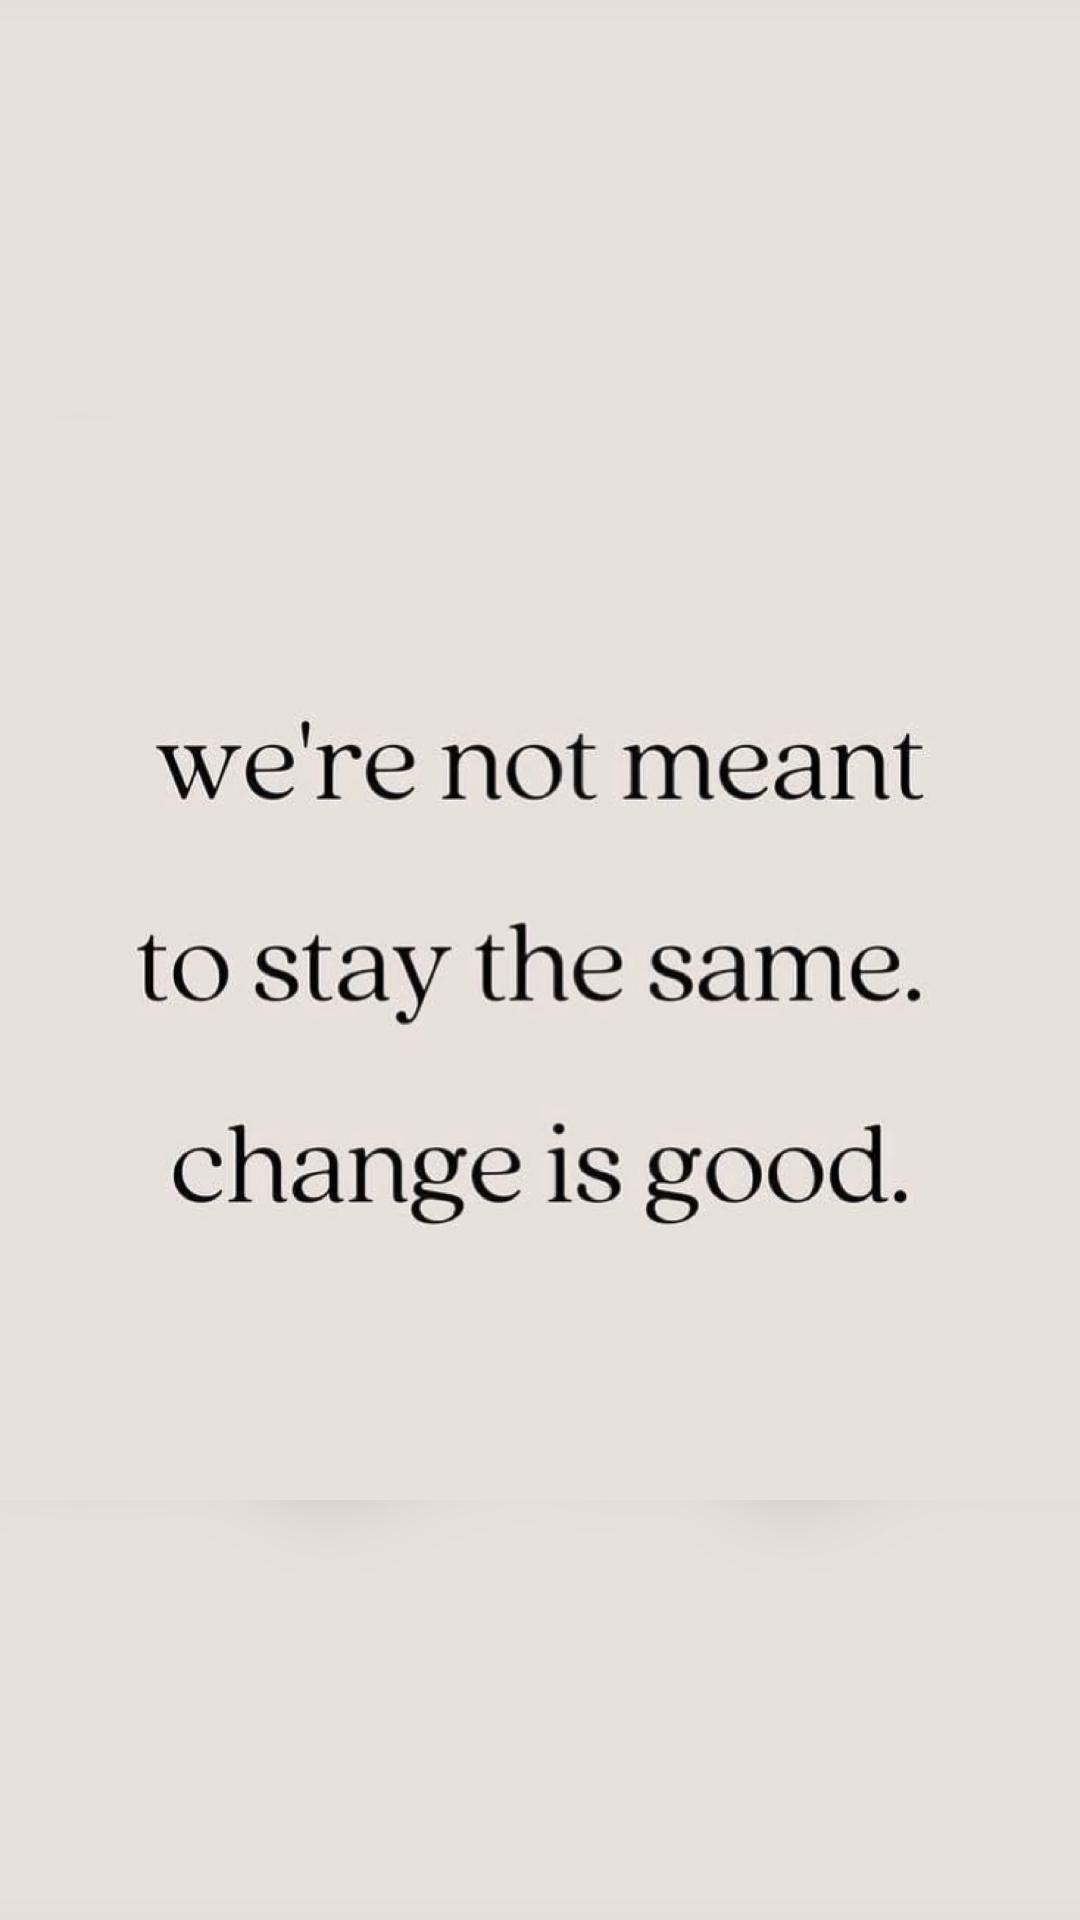 Change. Grow. Level up.